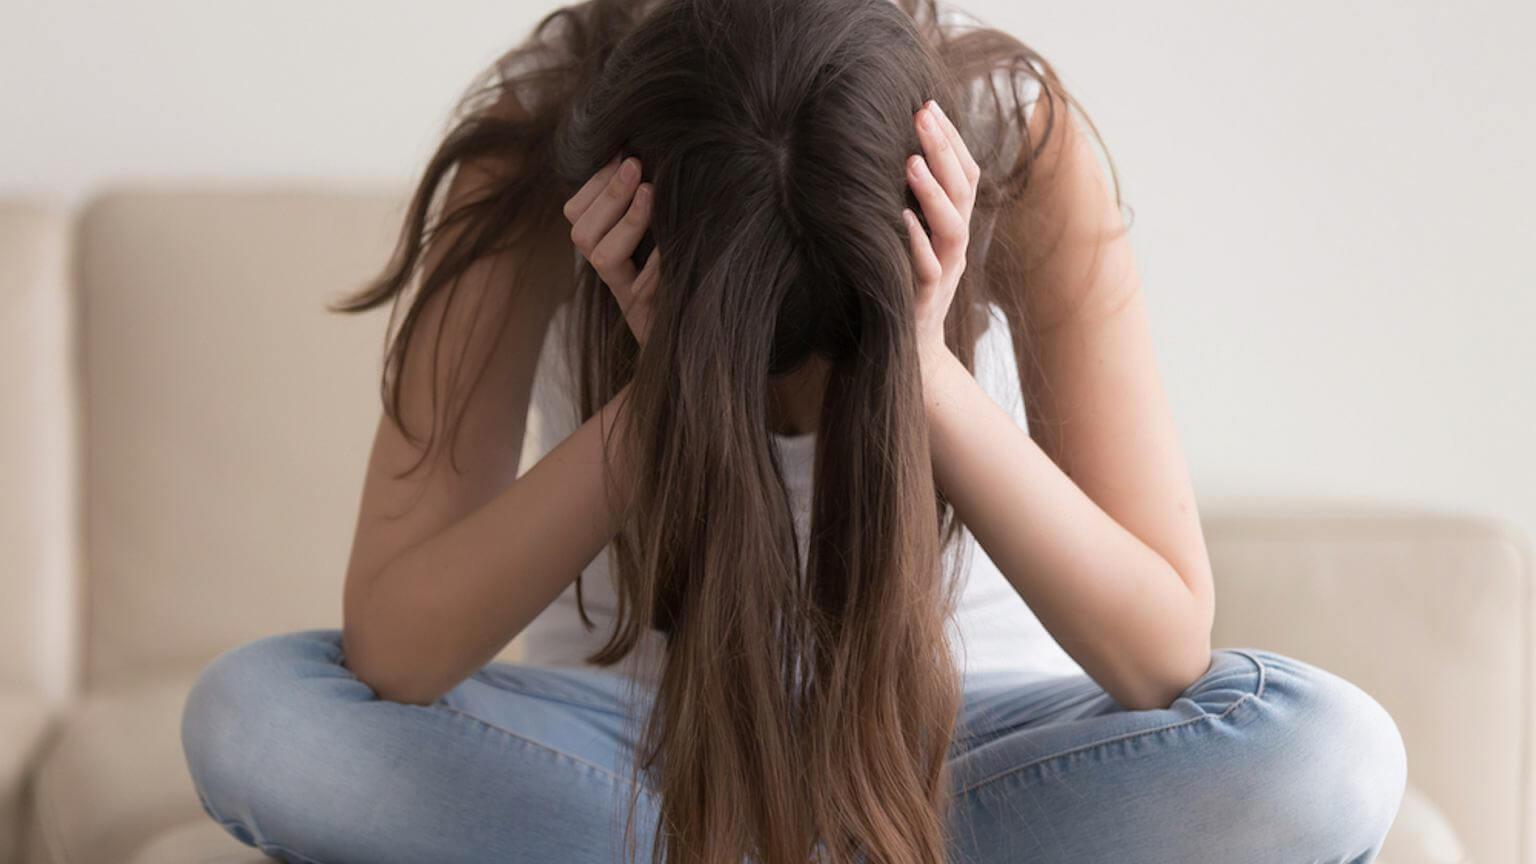 mujer adolescente preocupada